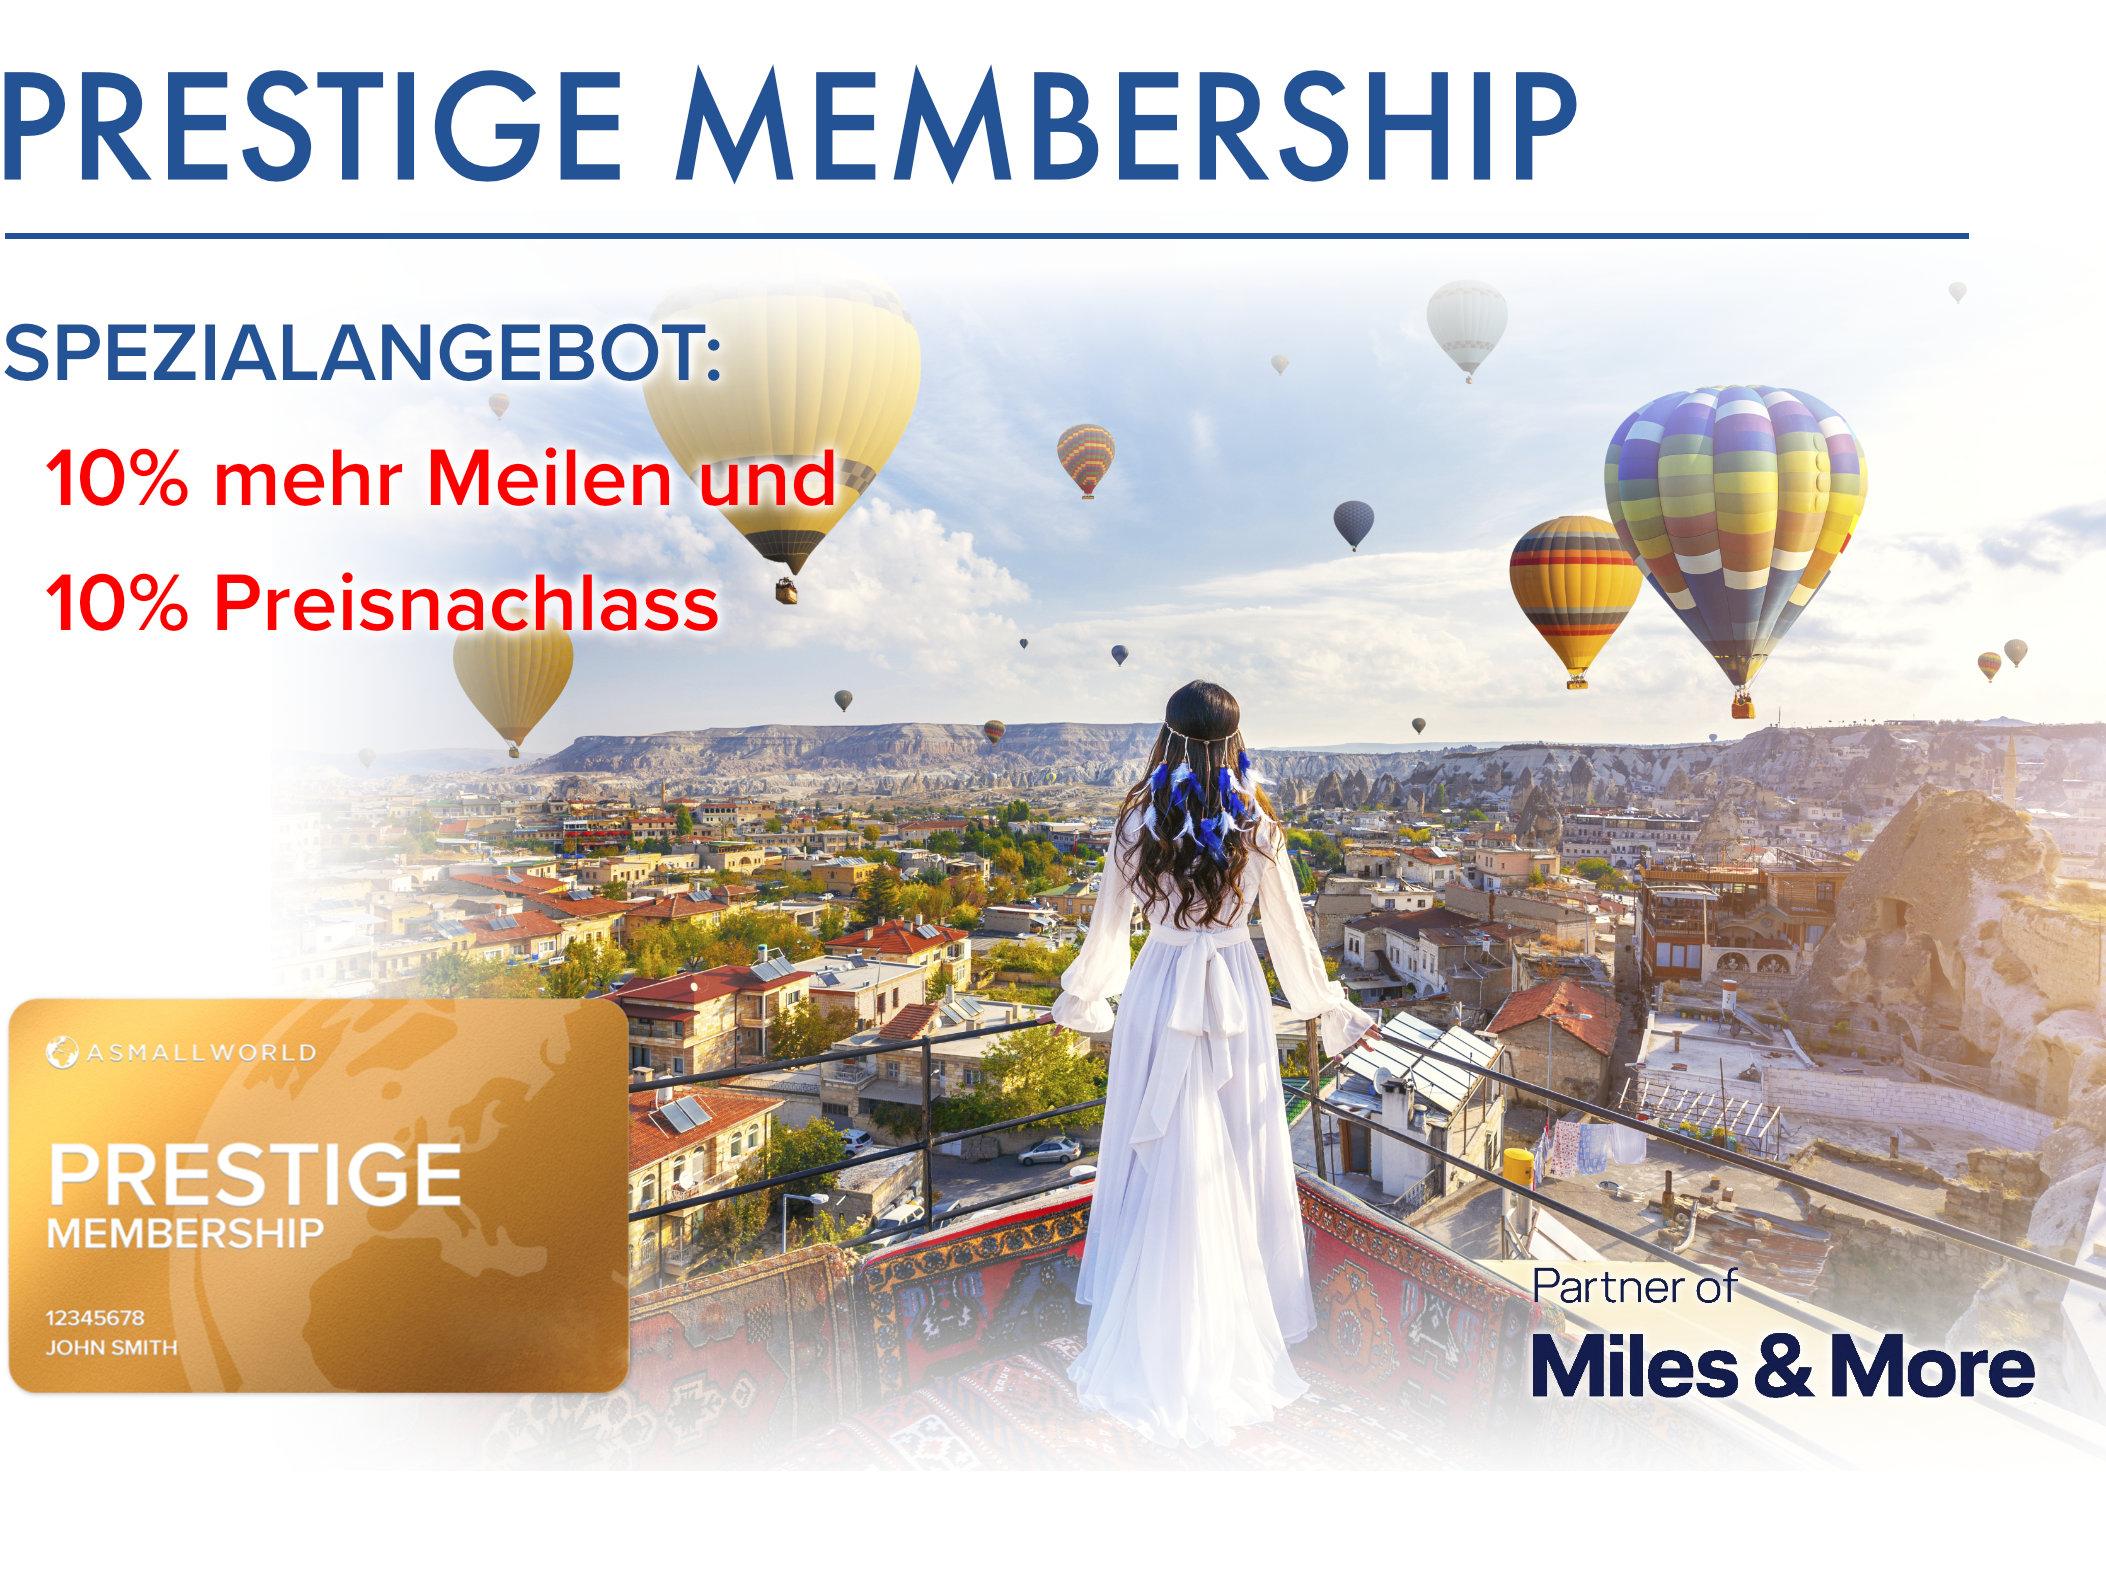 ASMALLWORLD Prestige Membership 275t Miles & More Prämienmeilen 4680€